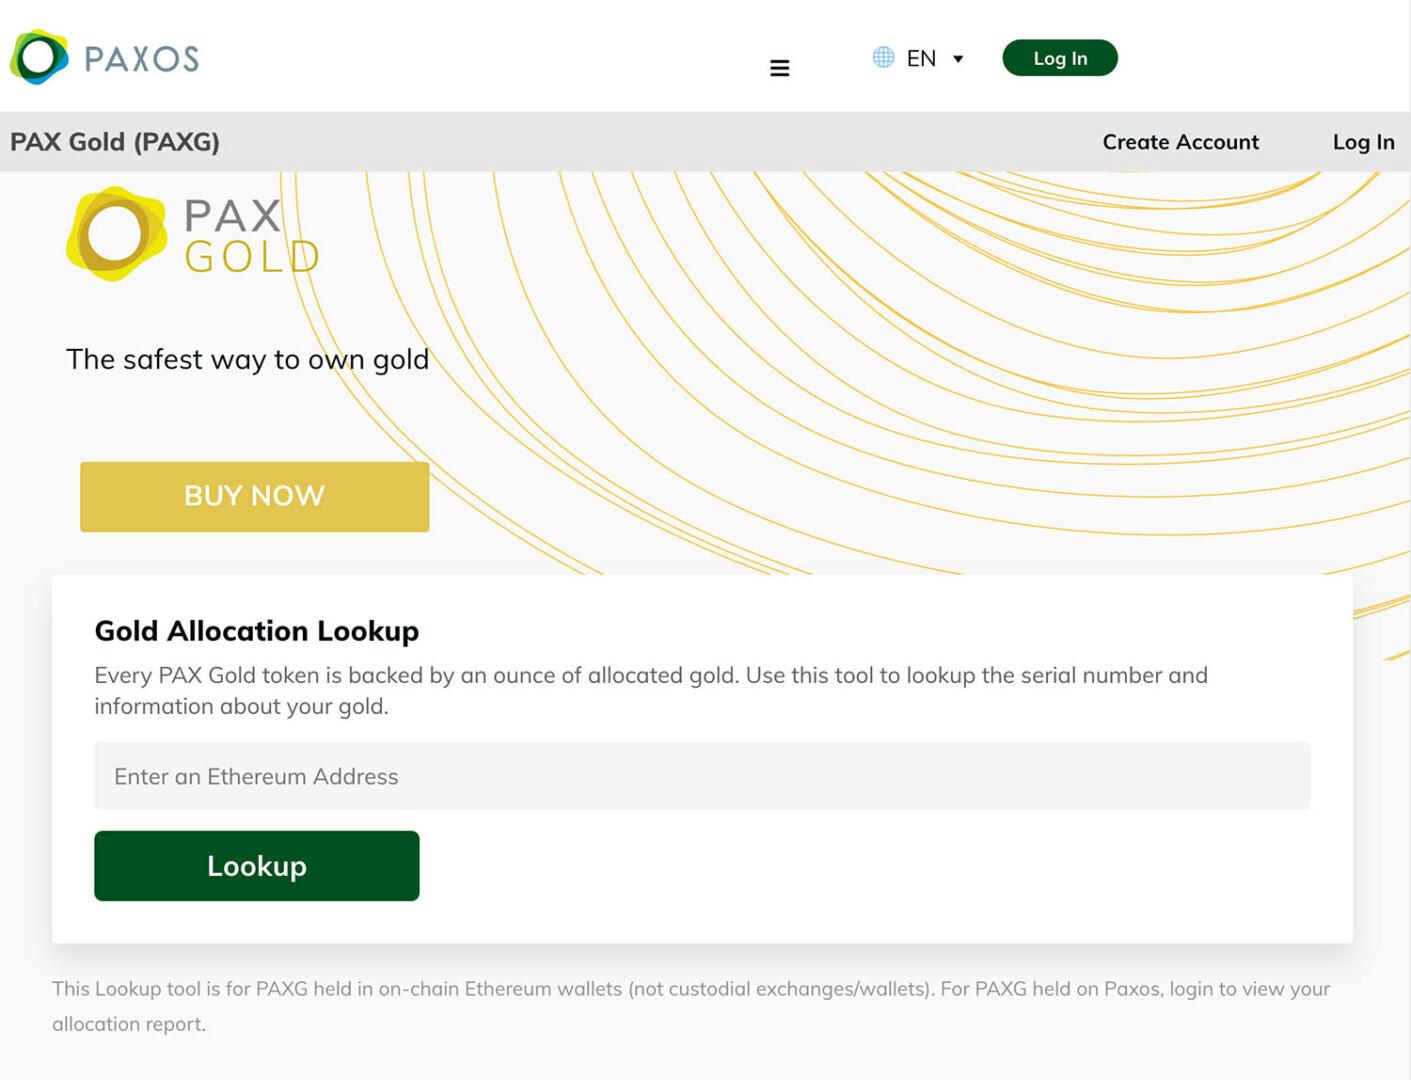 pax gold